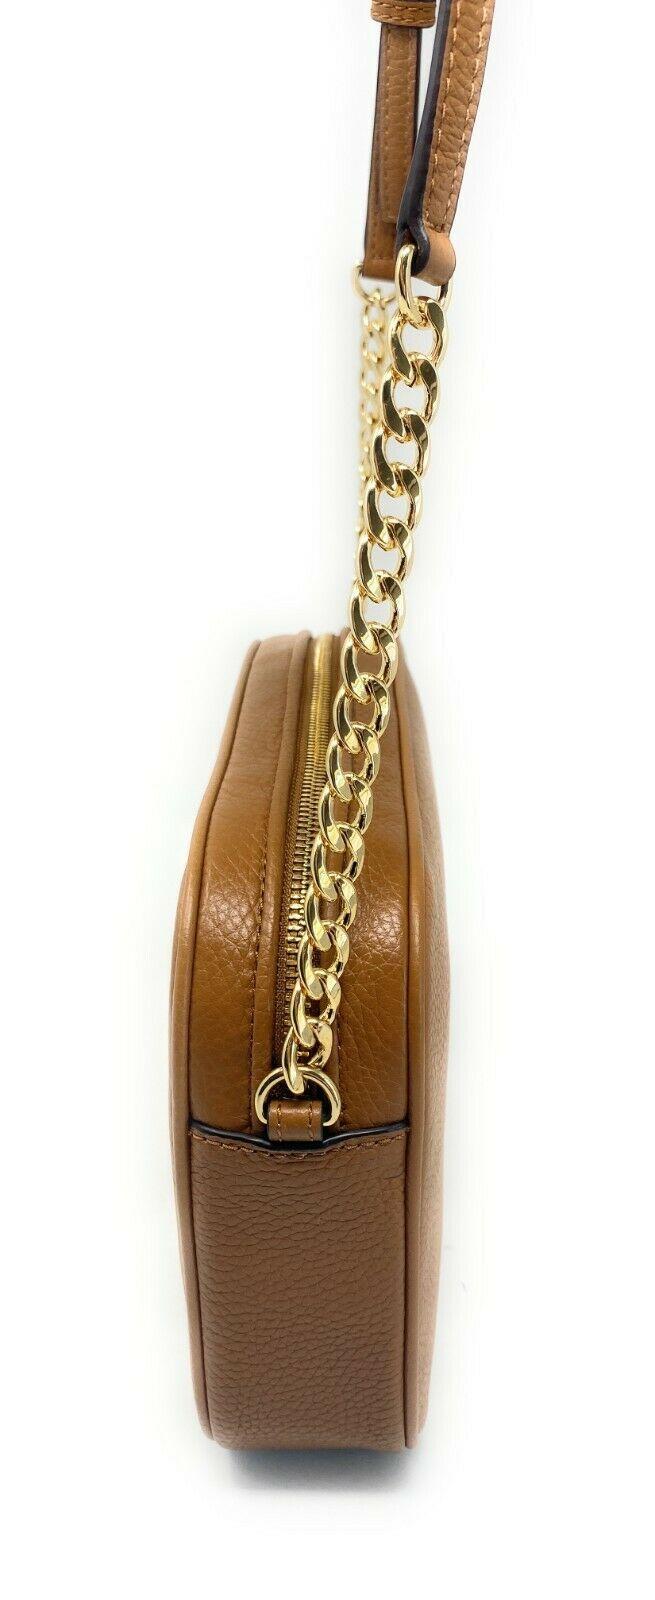 thumbnail 64 - Michael Kors Jet Set Item Large East West Crossbody Chain Handbag Clutch $298